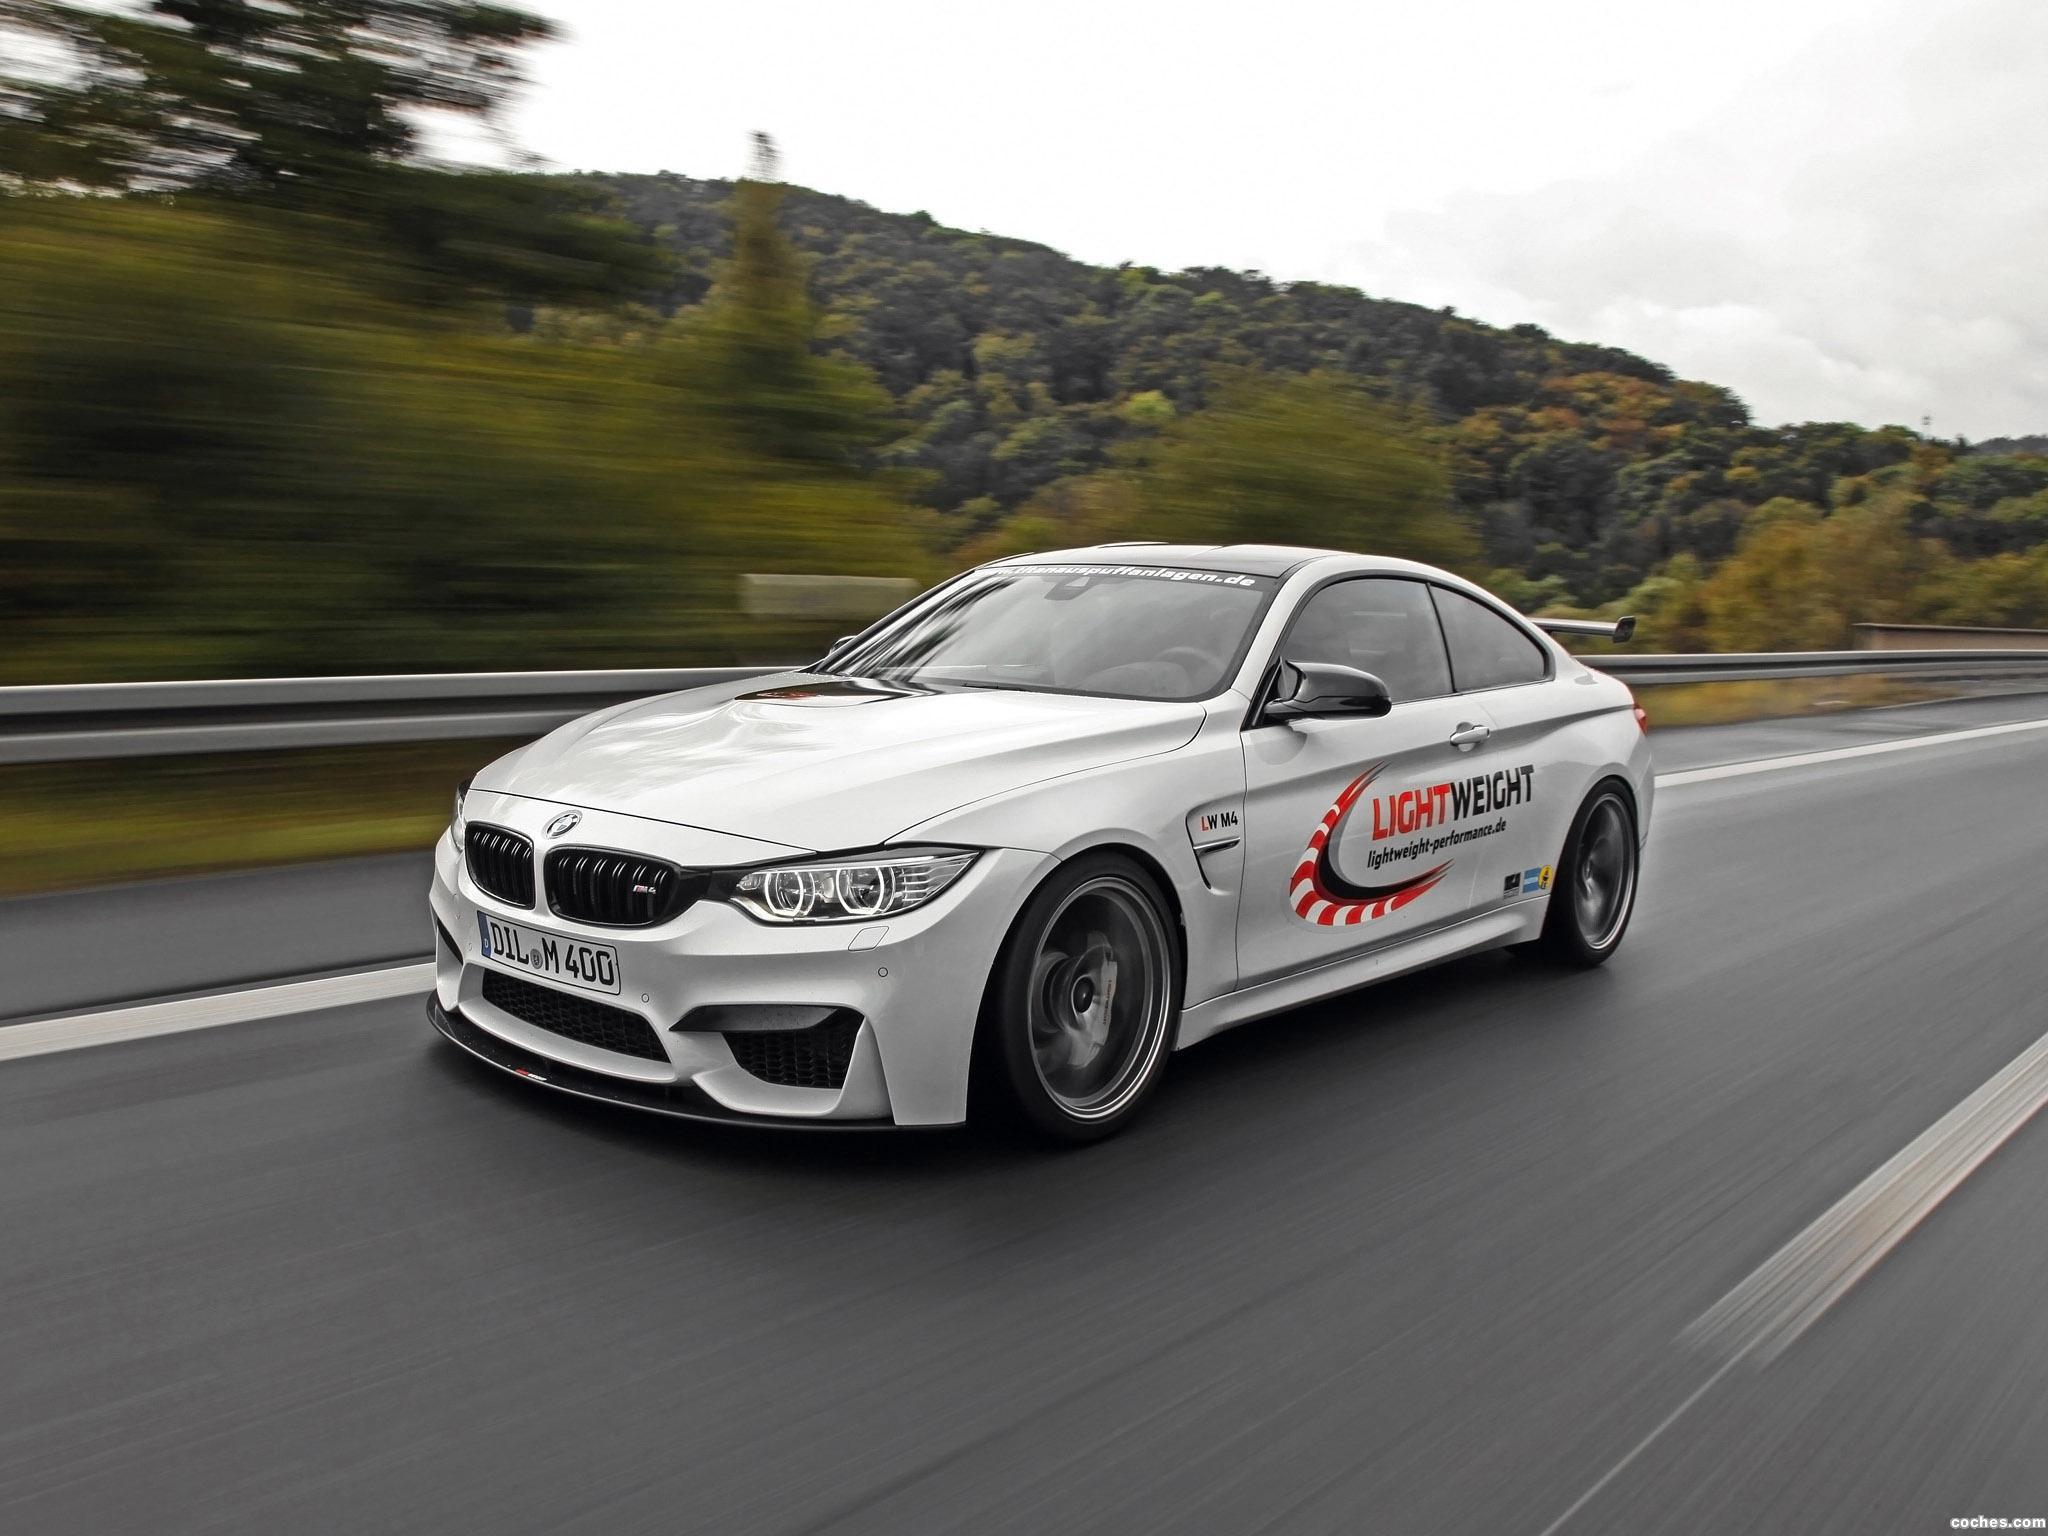 Foto 10 de BMW M4 LightWeight LW 2014